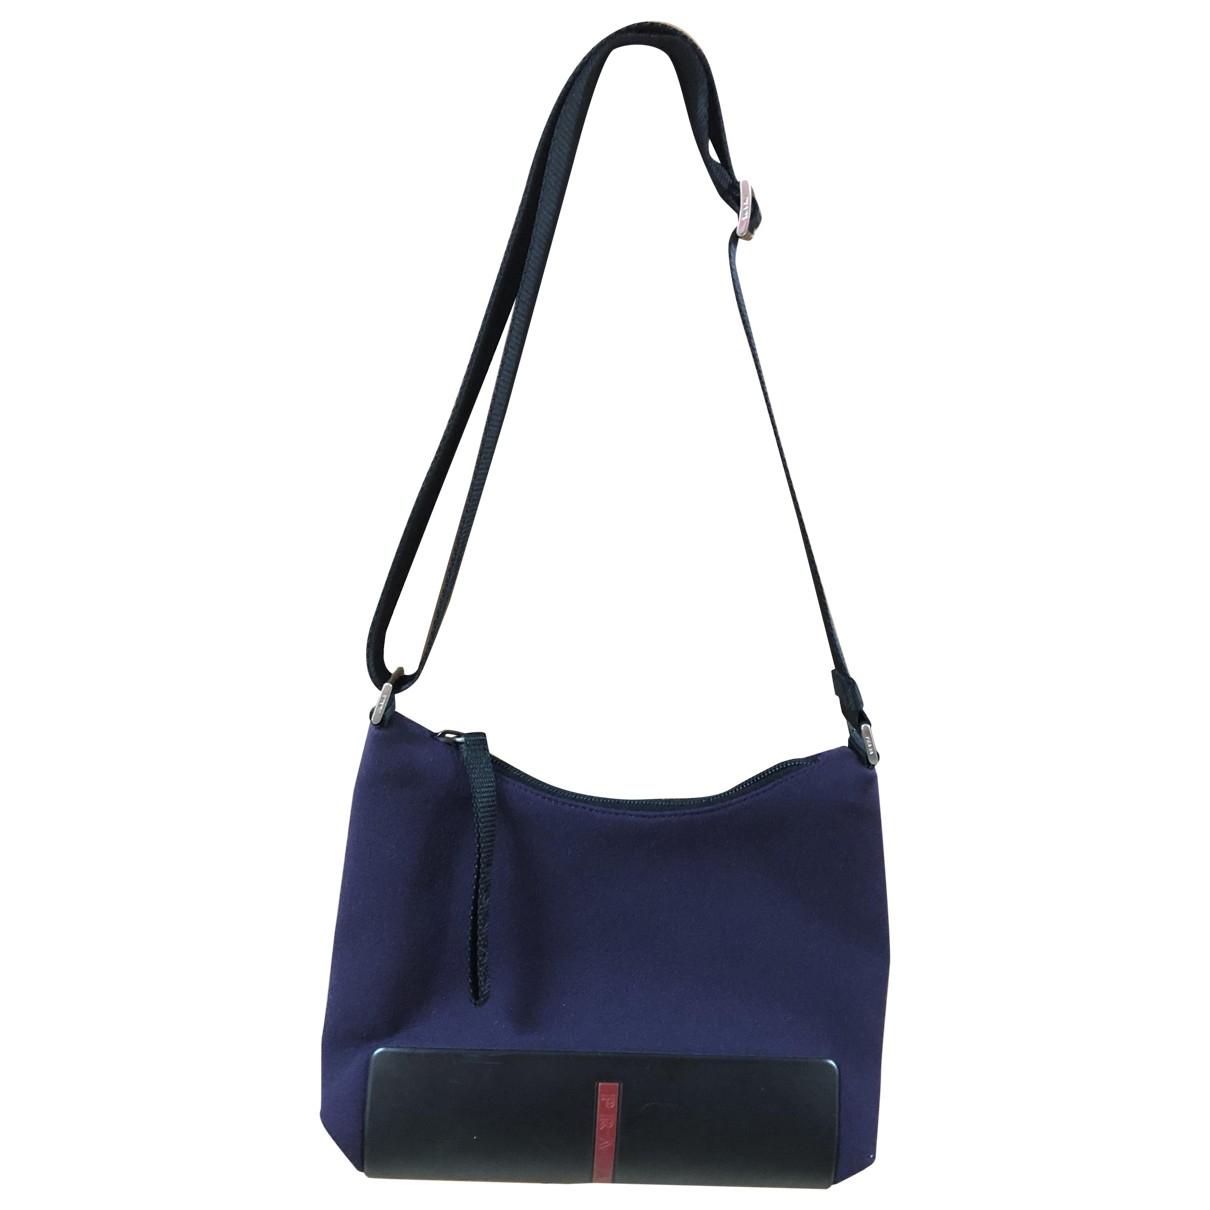 Prada \N Purple handbag for Women \N